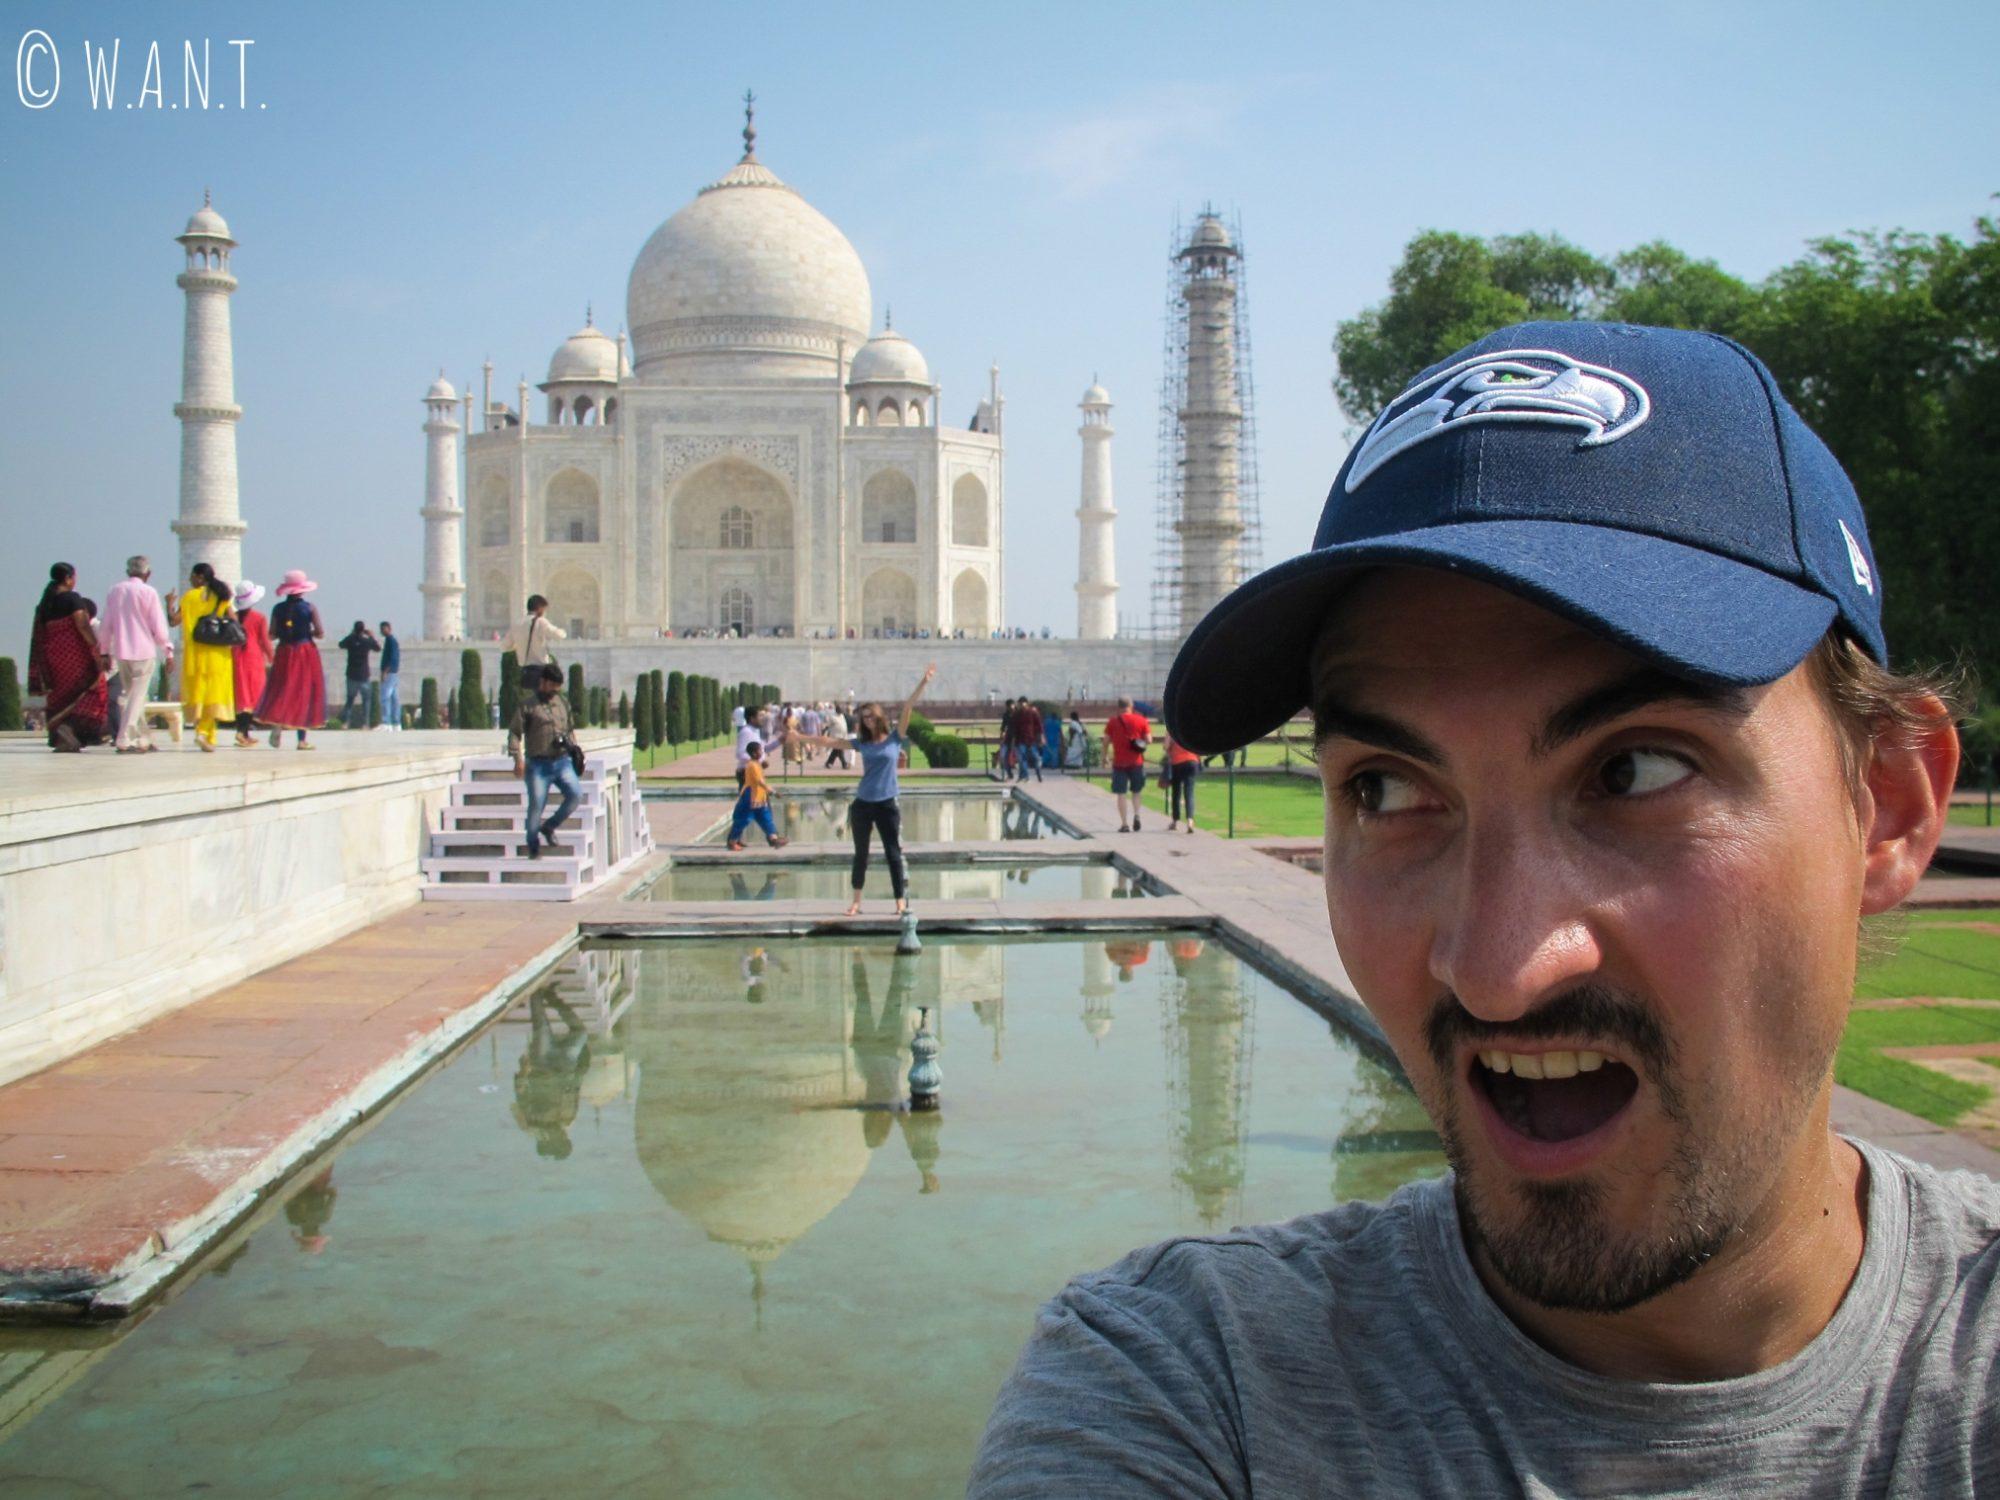 Lors de la visite du Taj Mahal, nous avons tenu à immortaliser ce moment